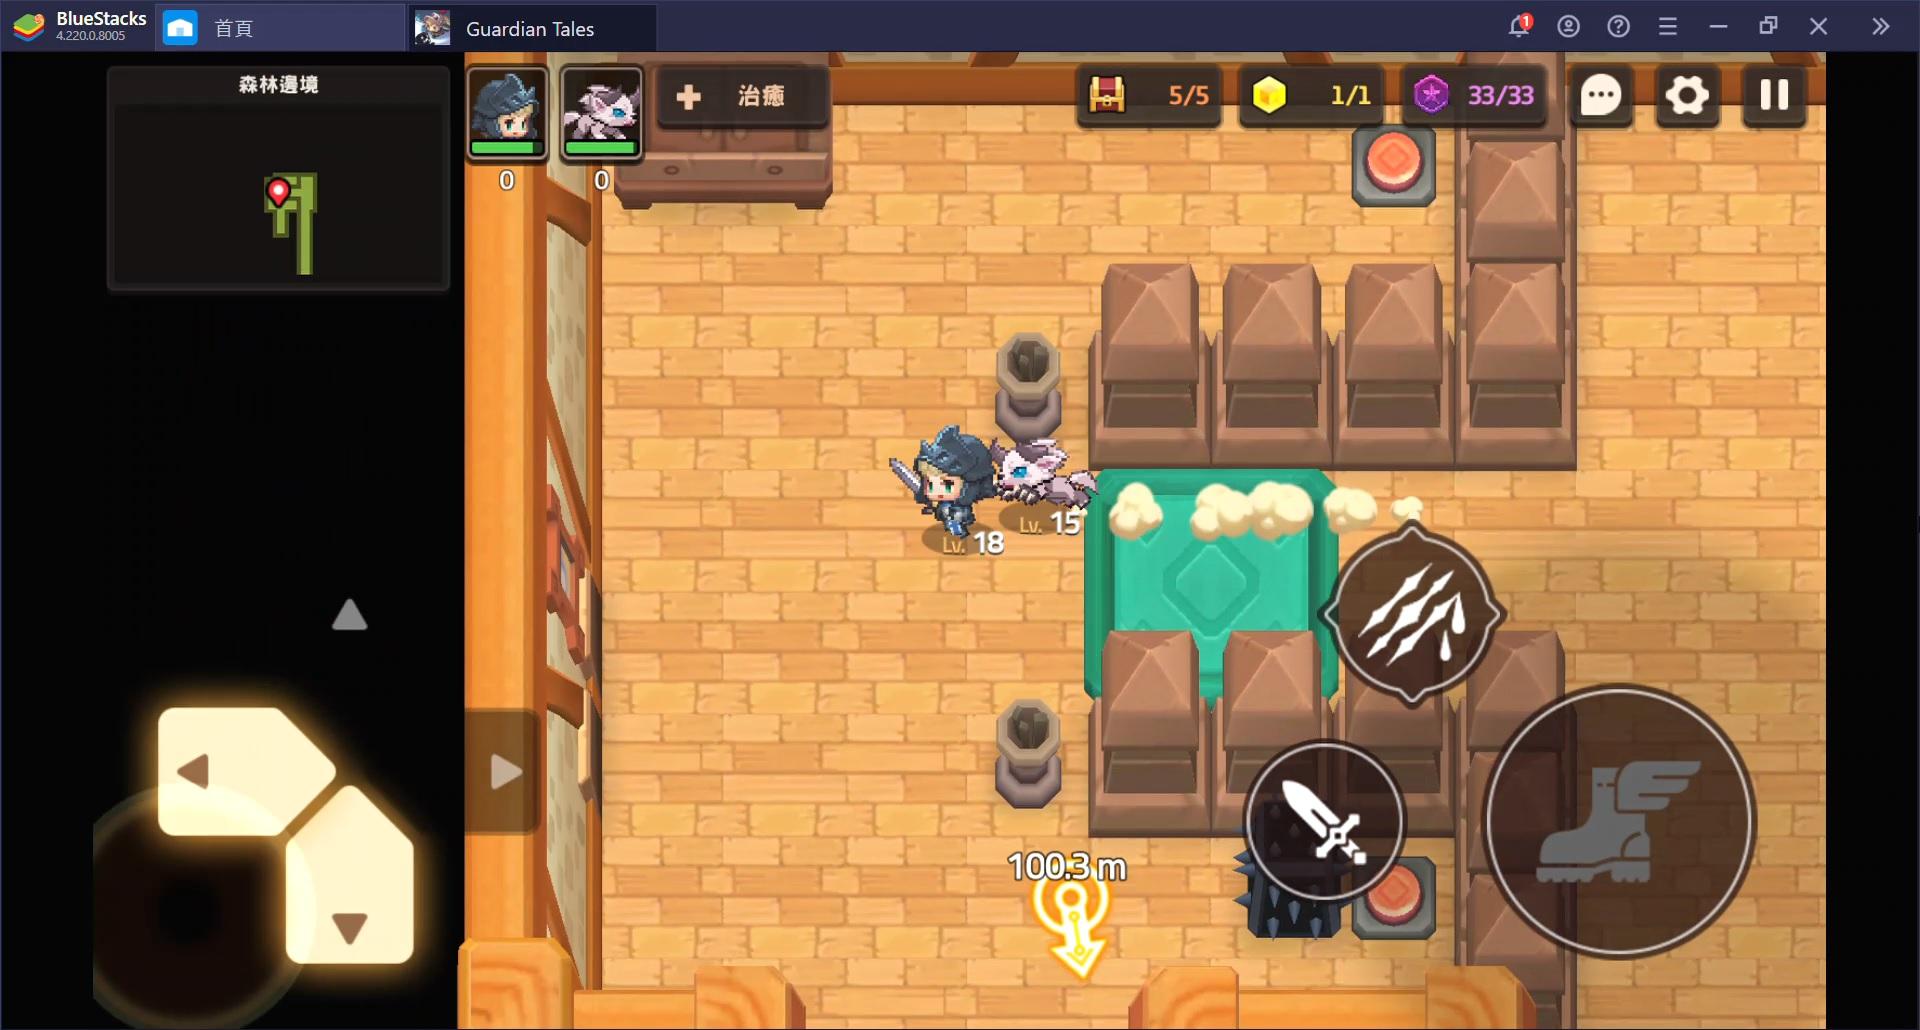 使用BlueStacks在PC上體驗冒險 RPG《守望傳說 Guardian Tales》